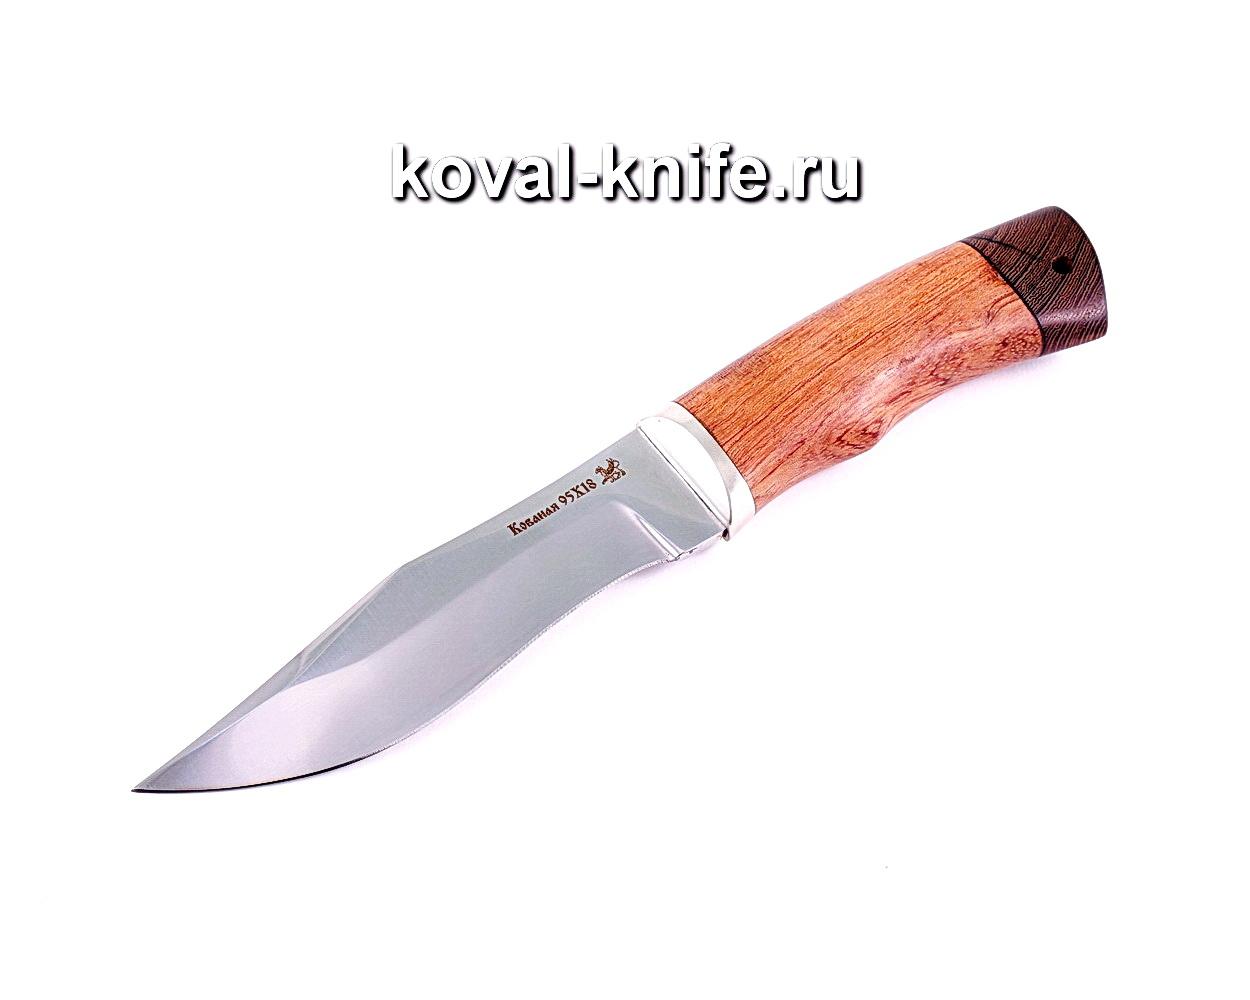 Нож Охотничий (сталь 95х18), рукоять бубинга, венге A014